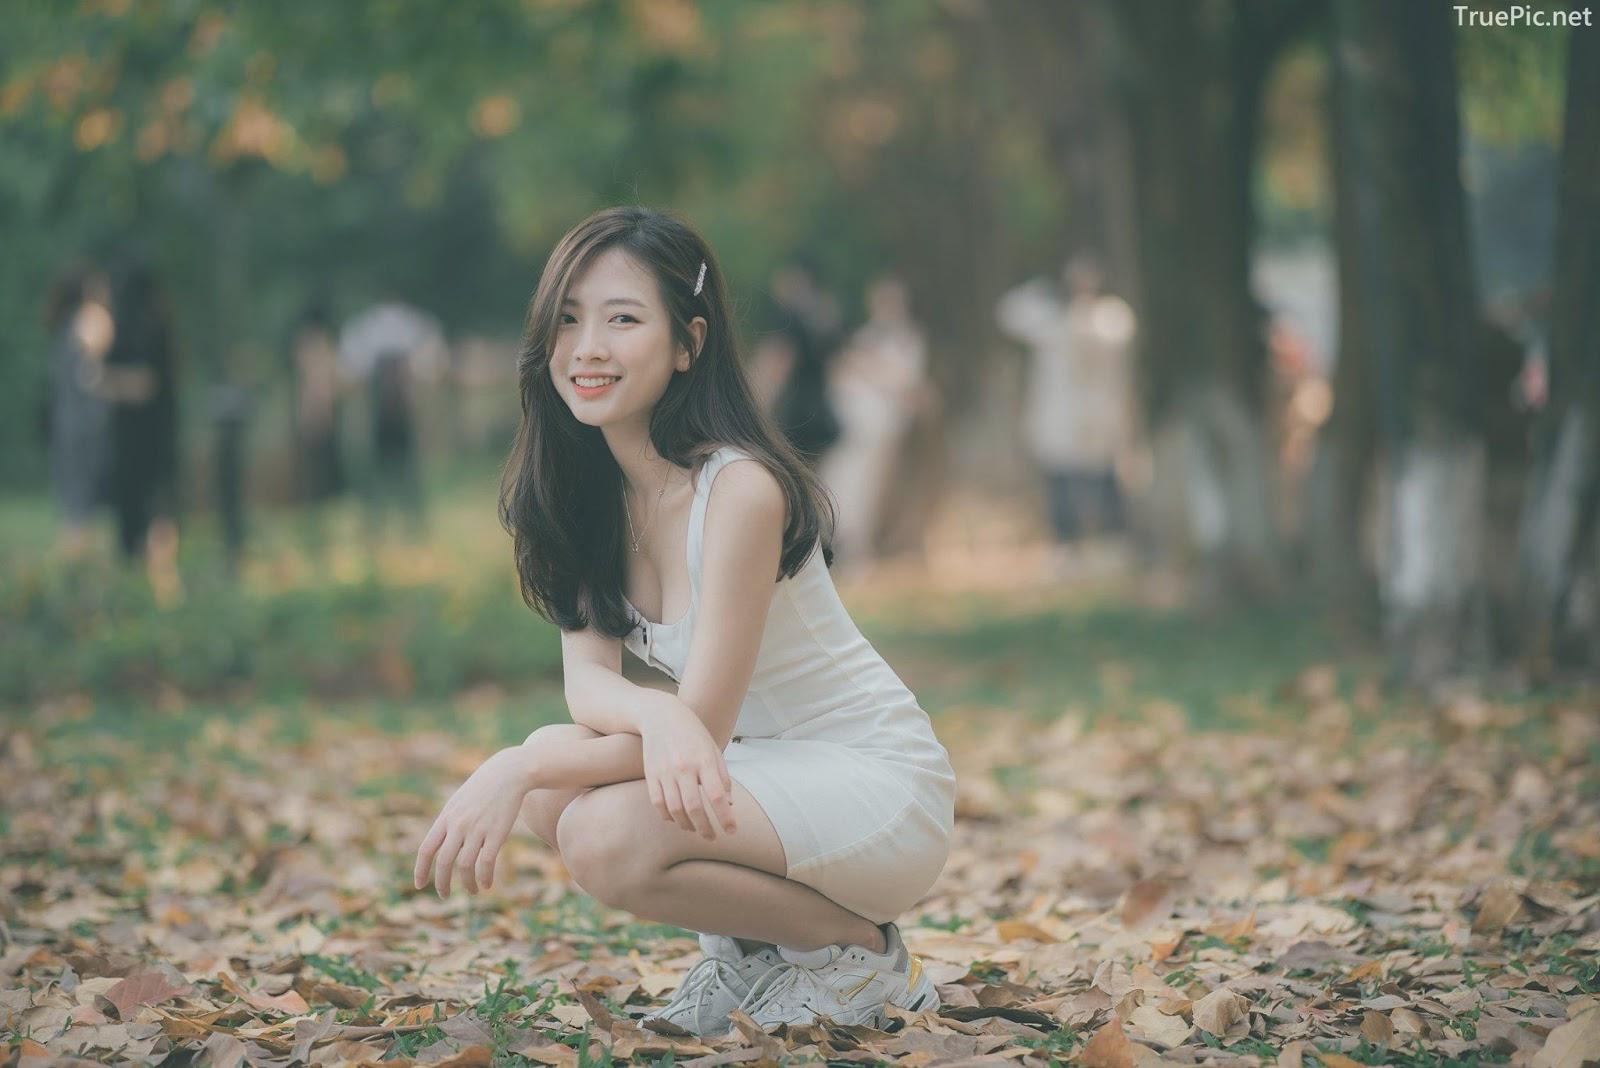 Vietnamese Hot Girl Linh Hoai - Season of falling leaves - TruePic.net - Picture 4